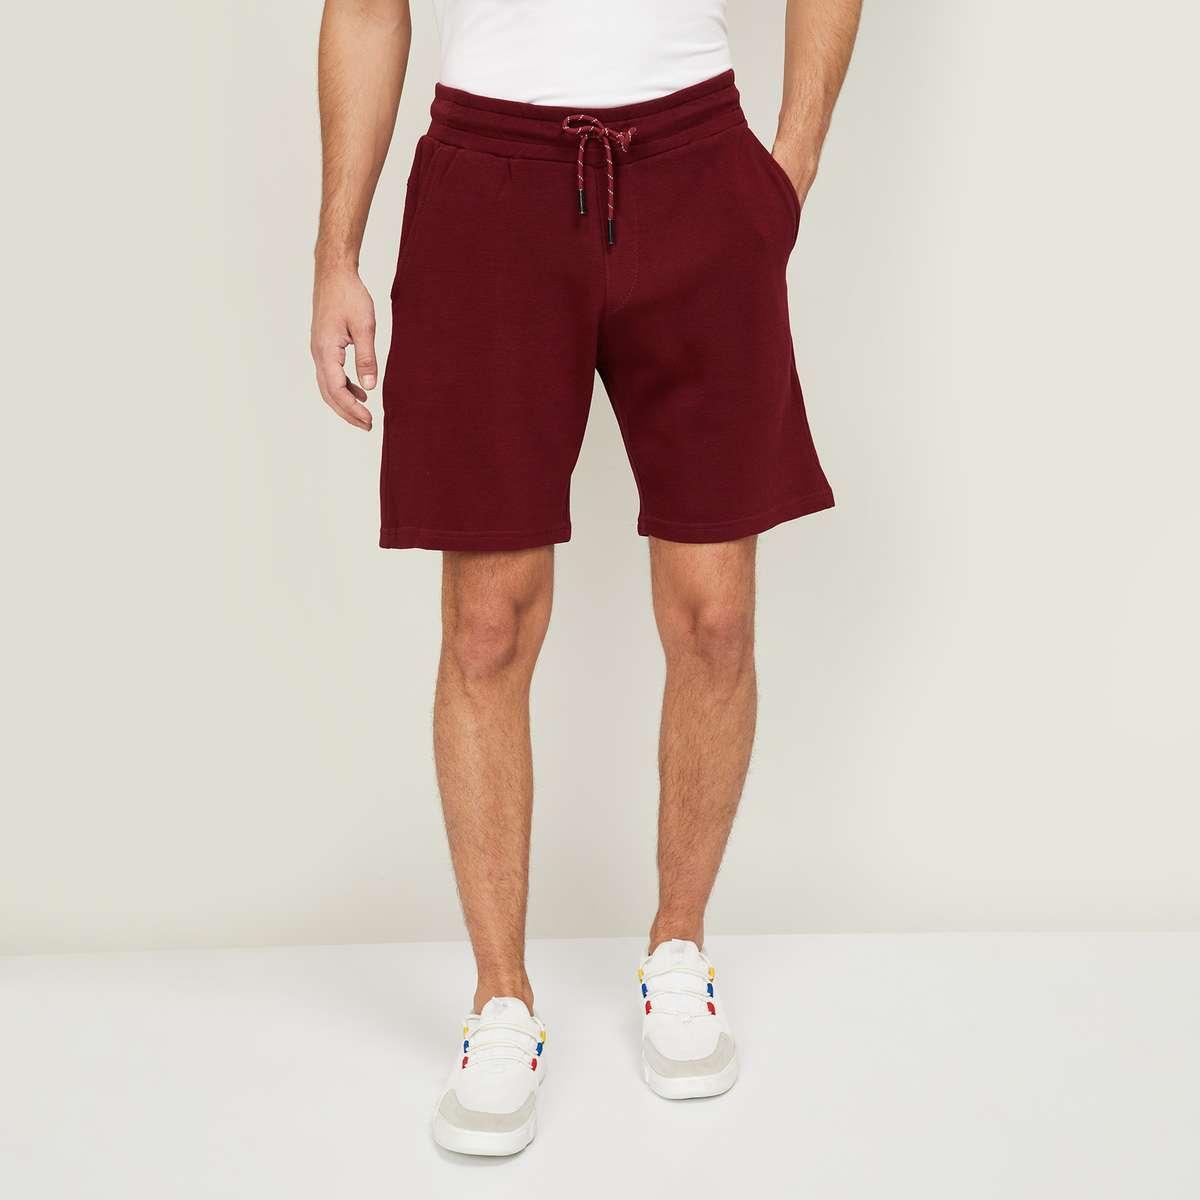 3.LEE COOPER Men Solid Elasticated Shorts